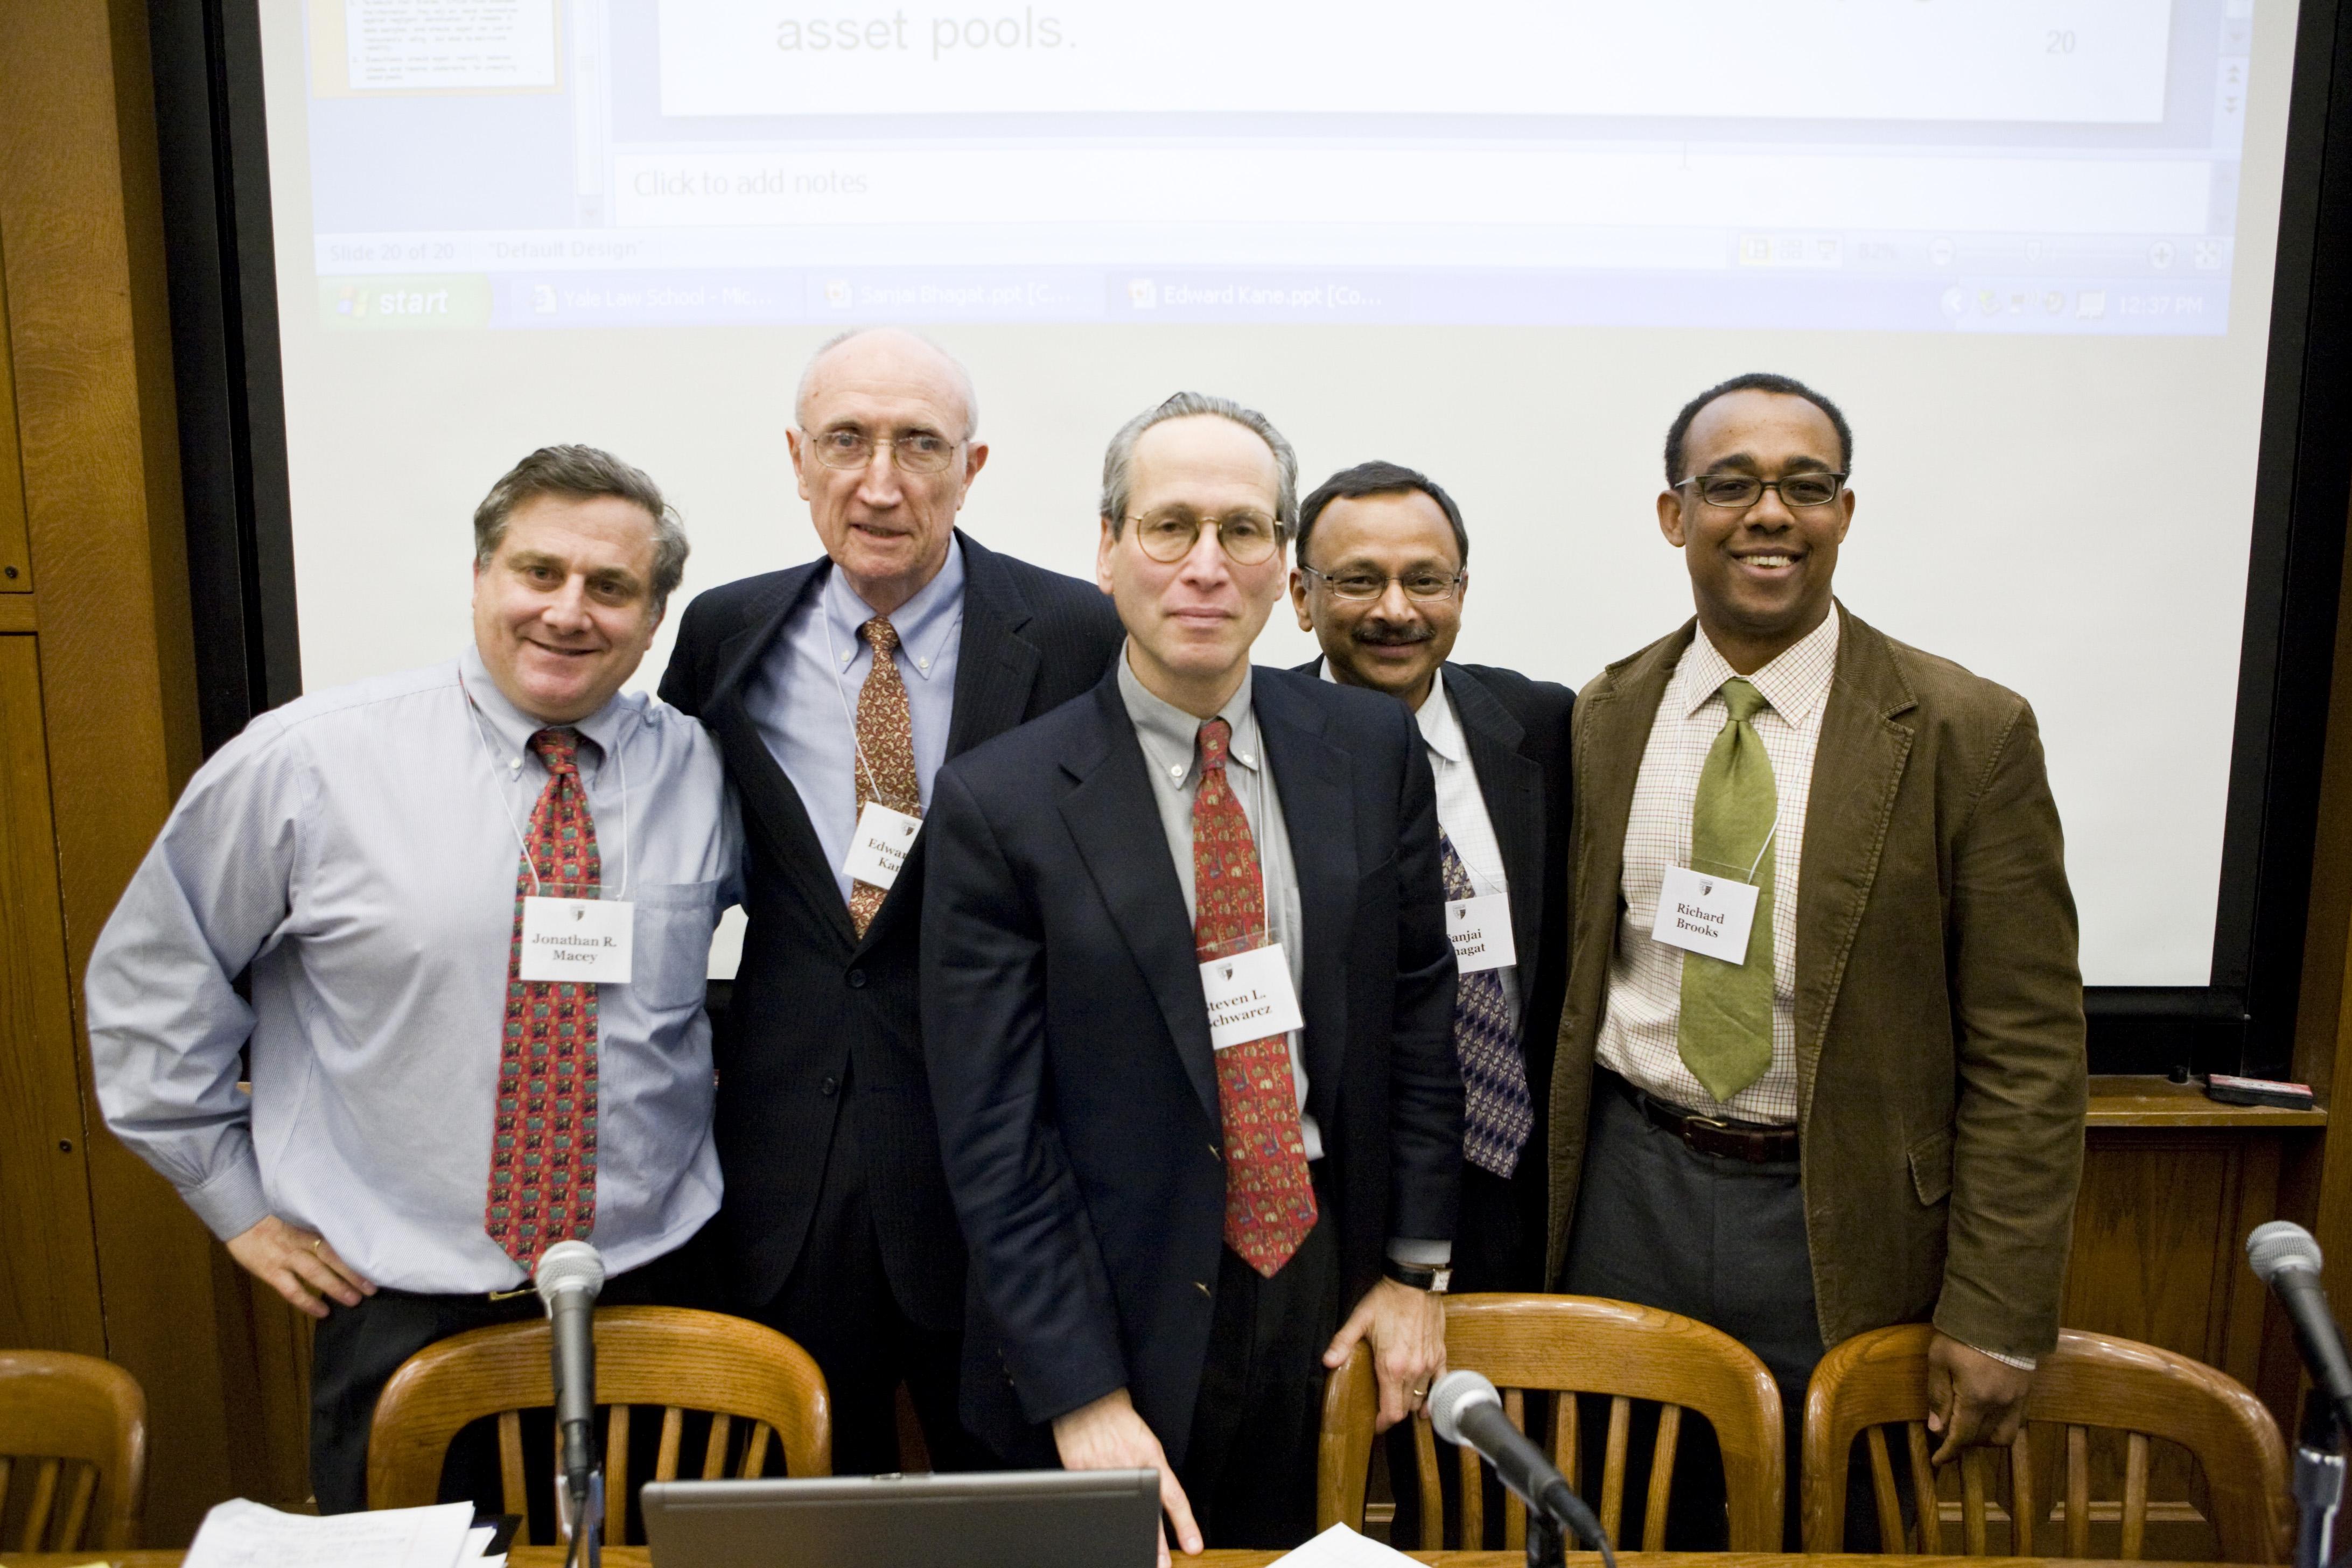 YLS Prof. Jonathan Macey '82, Boston College Fin. Prof. Edward Kane, Duke Law Prof. Steven Schwarcz, U. of Colorado Bus. Prof. Sanjai Bhagat, and YLS Prof. Richard Brooks